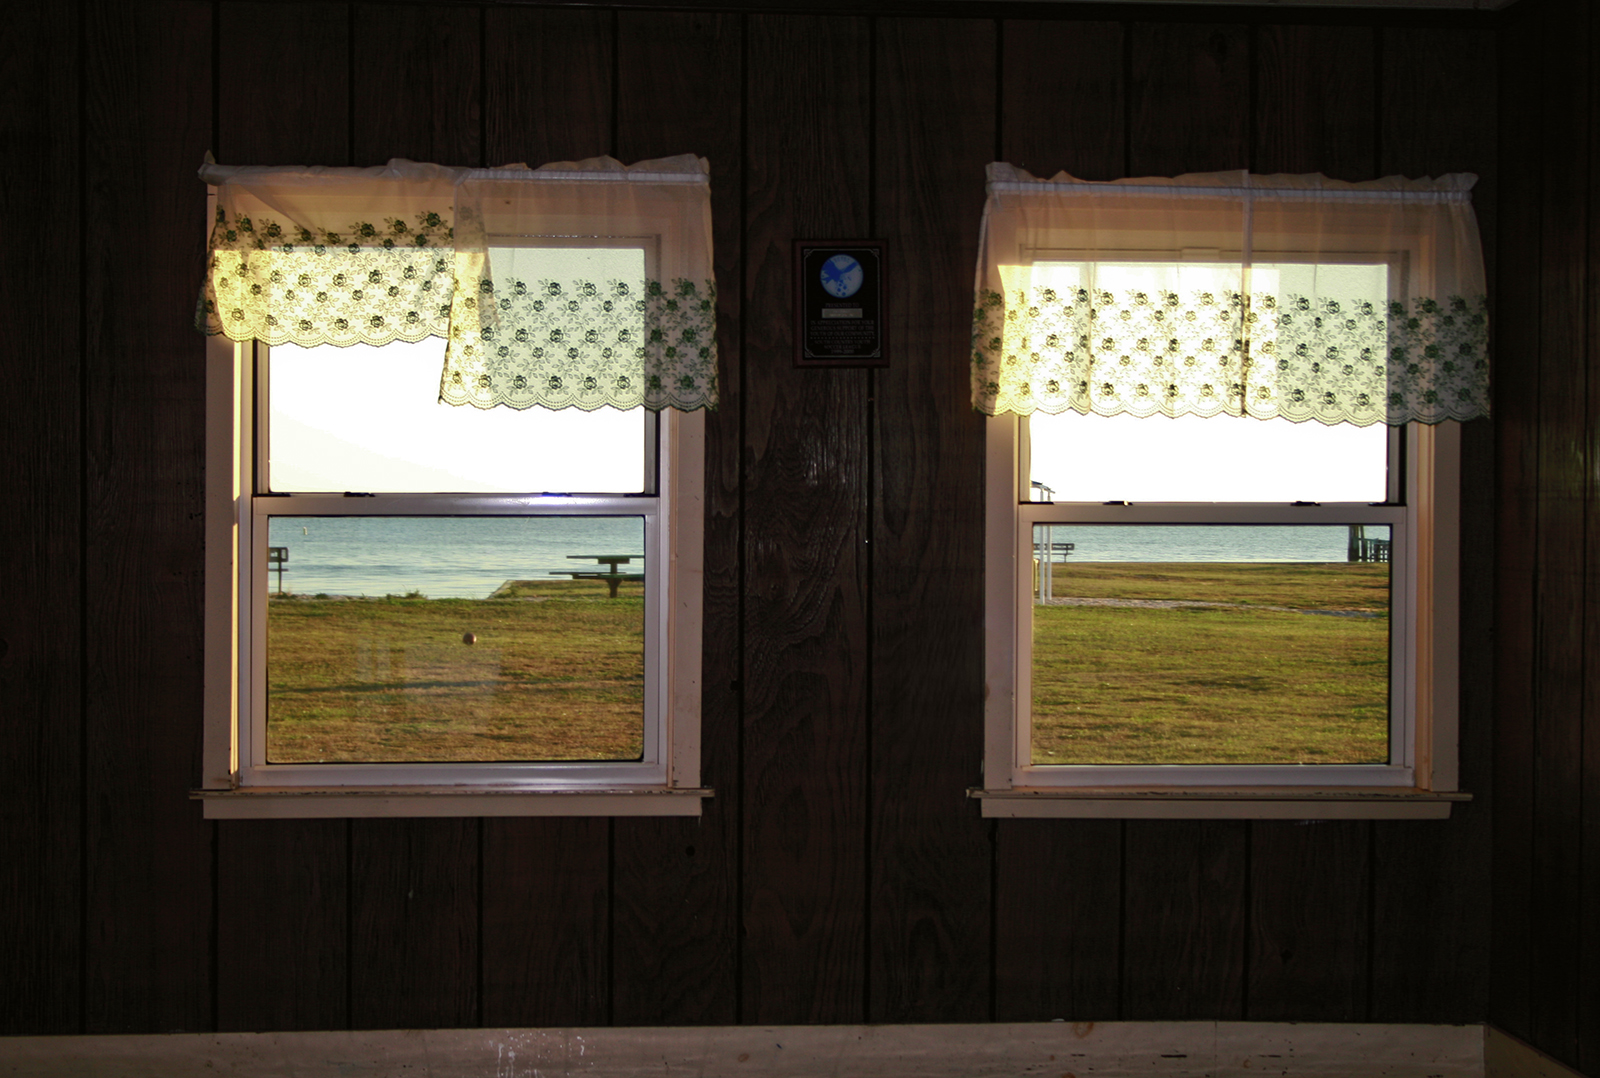 Windows, Bayport, Long Island